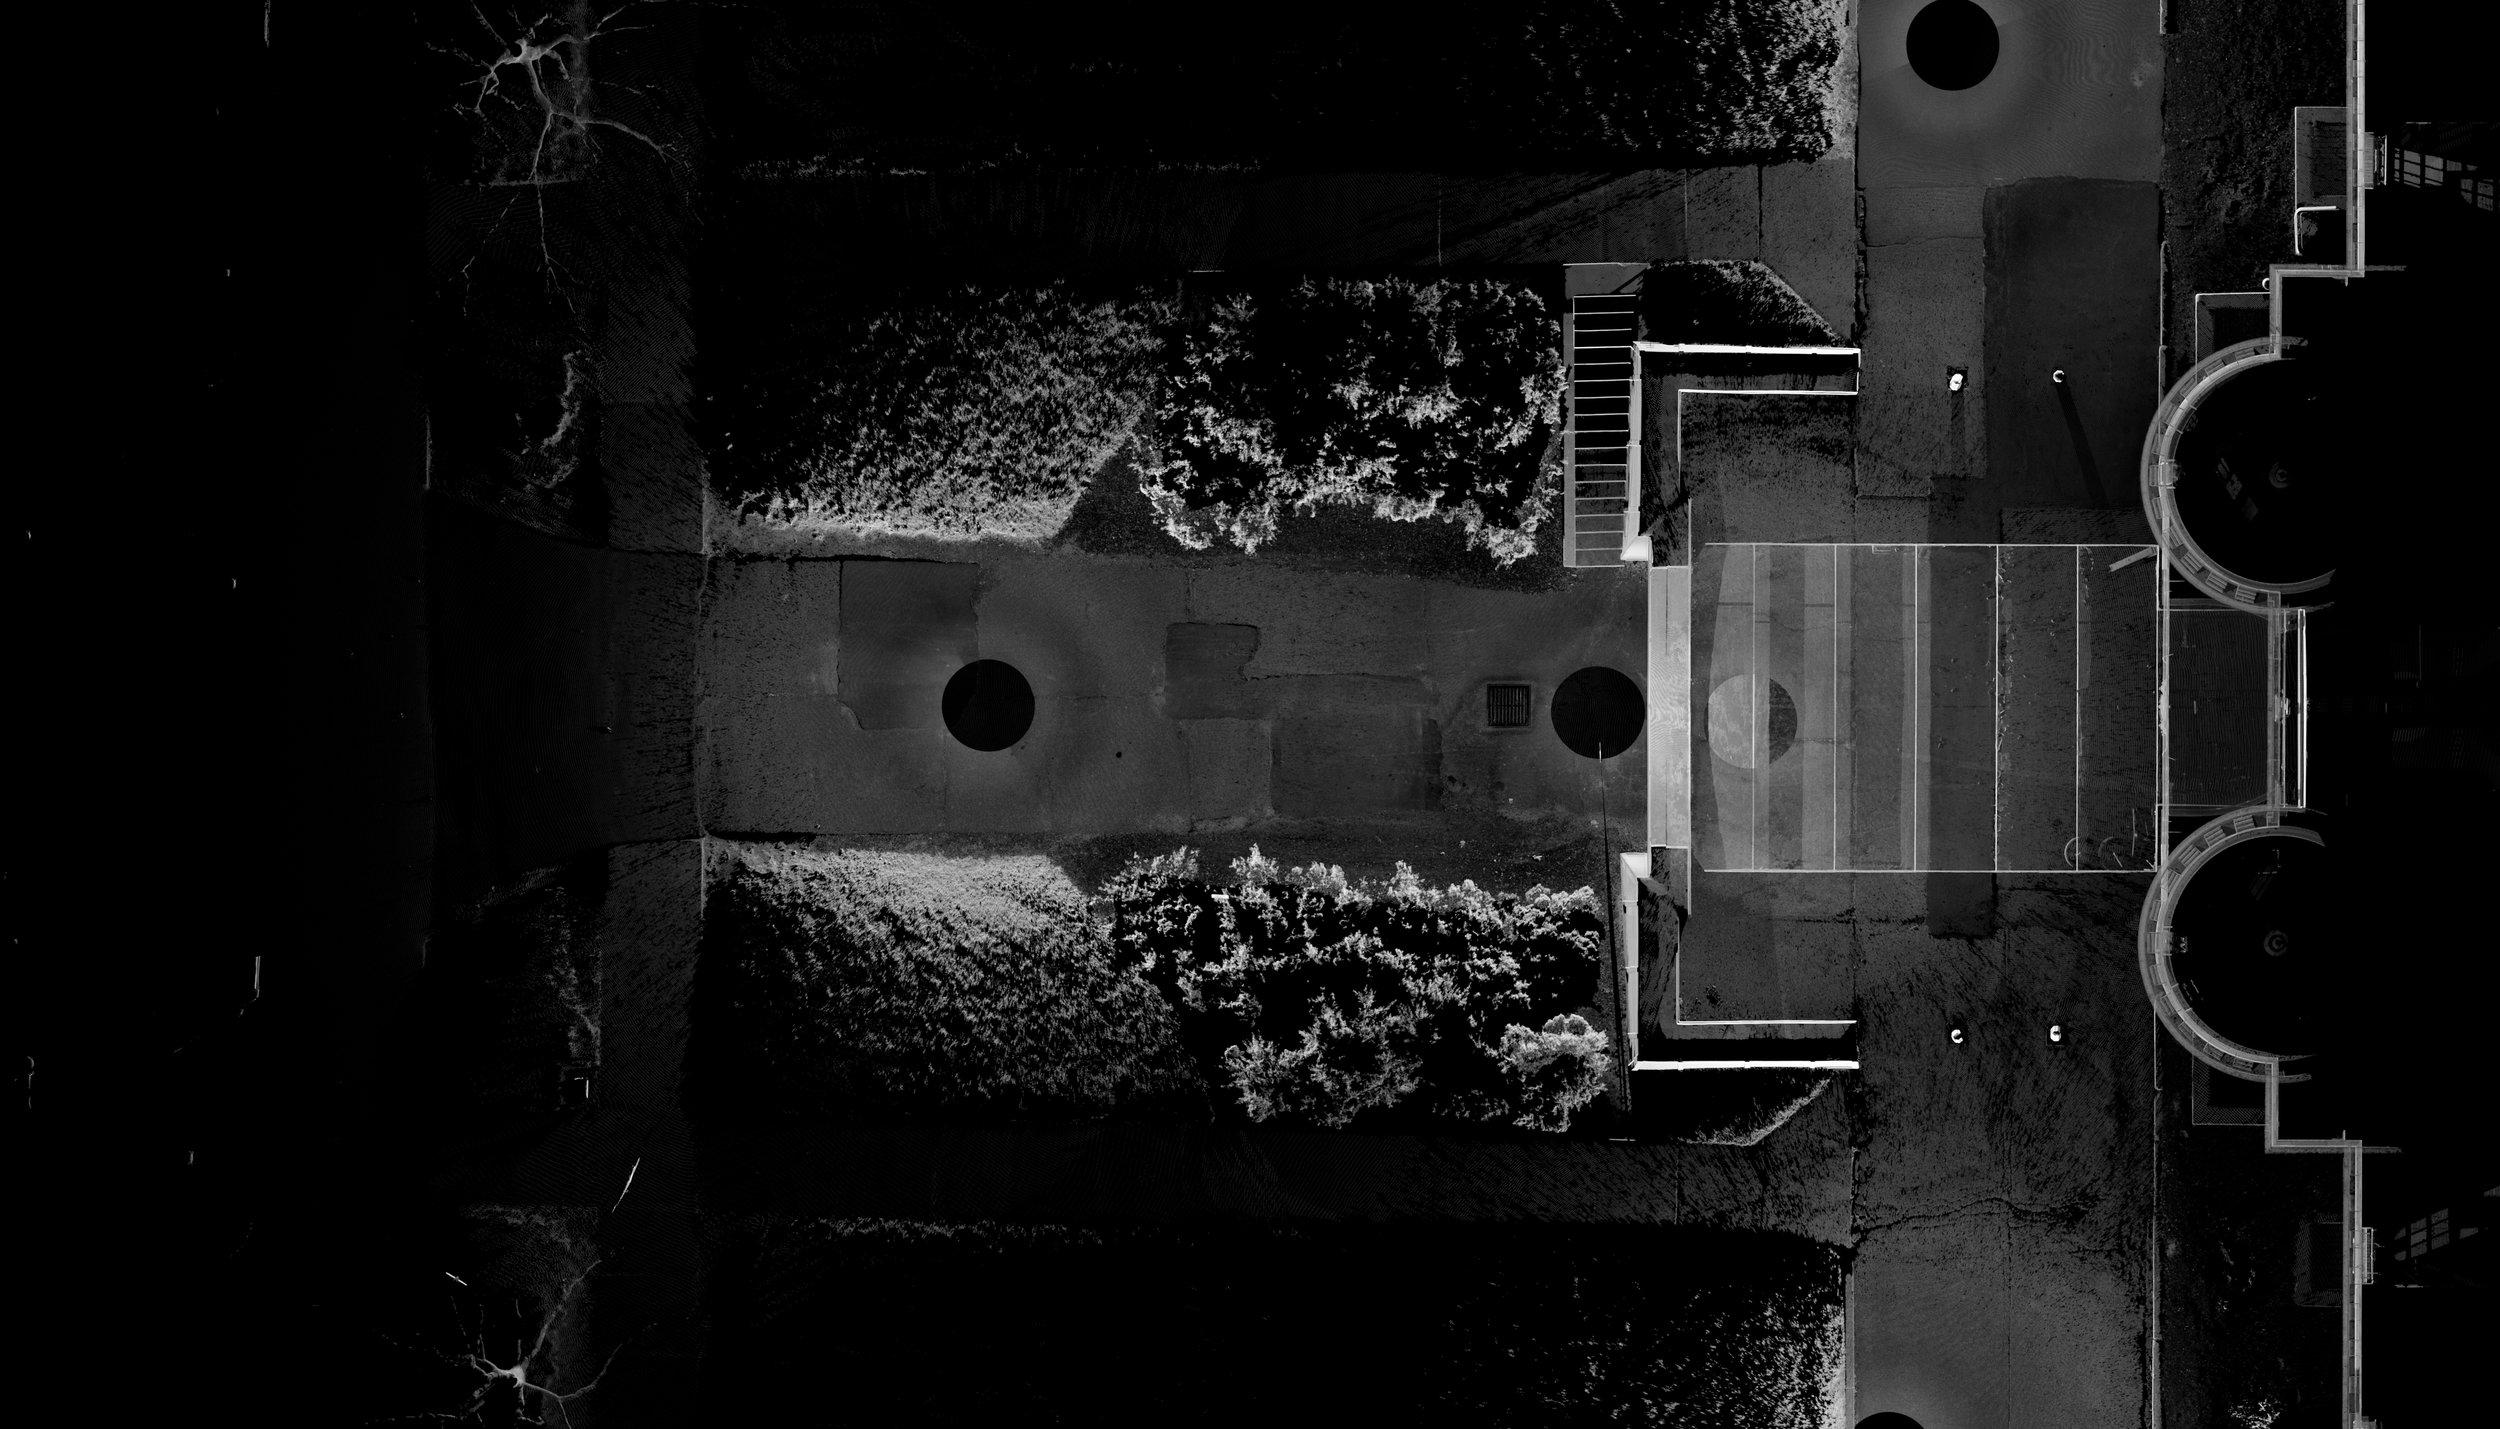 MYNDWORKSHOP_rensselaer-polytechnic-institute-3D-laser-scanning-point-cloud-new-york-ARMORY-4.jpg